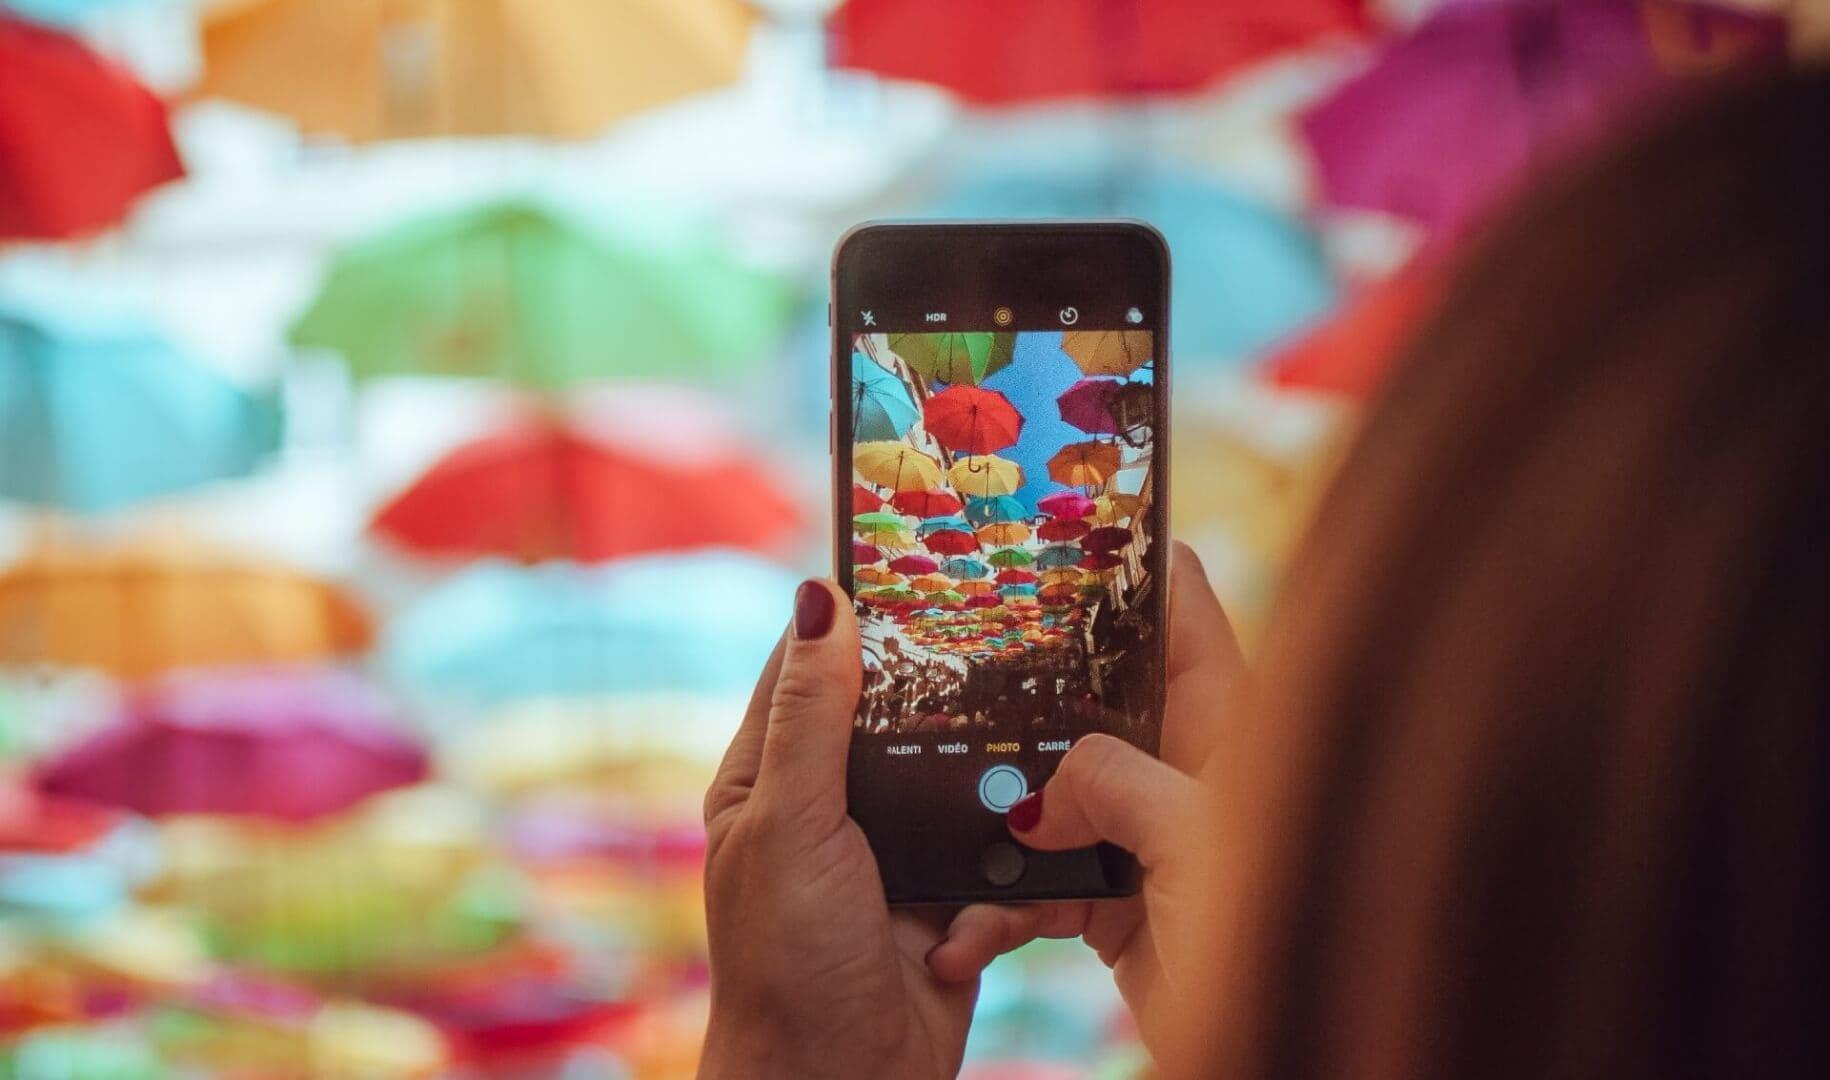 Girl taking a photo on her phone for social media